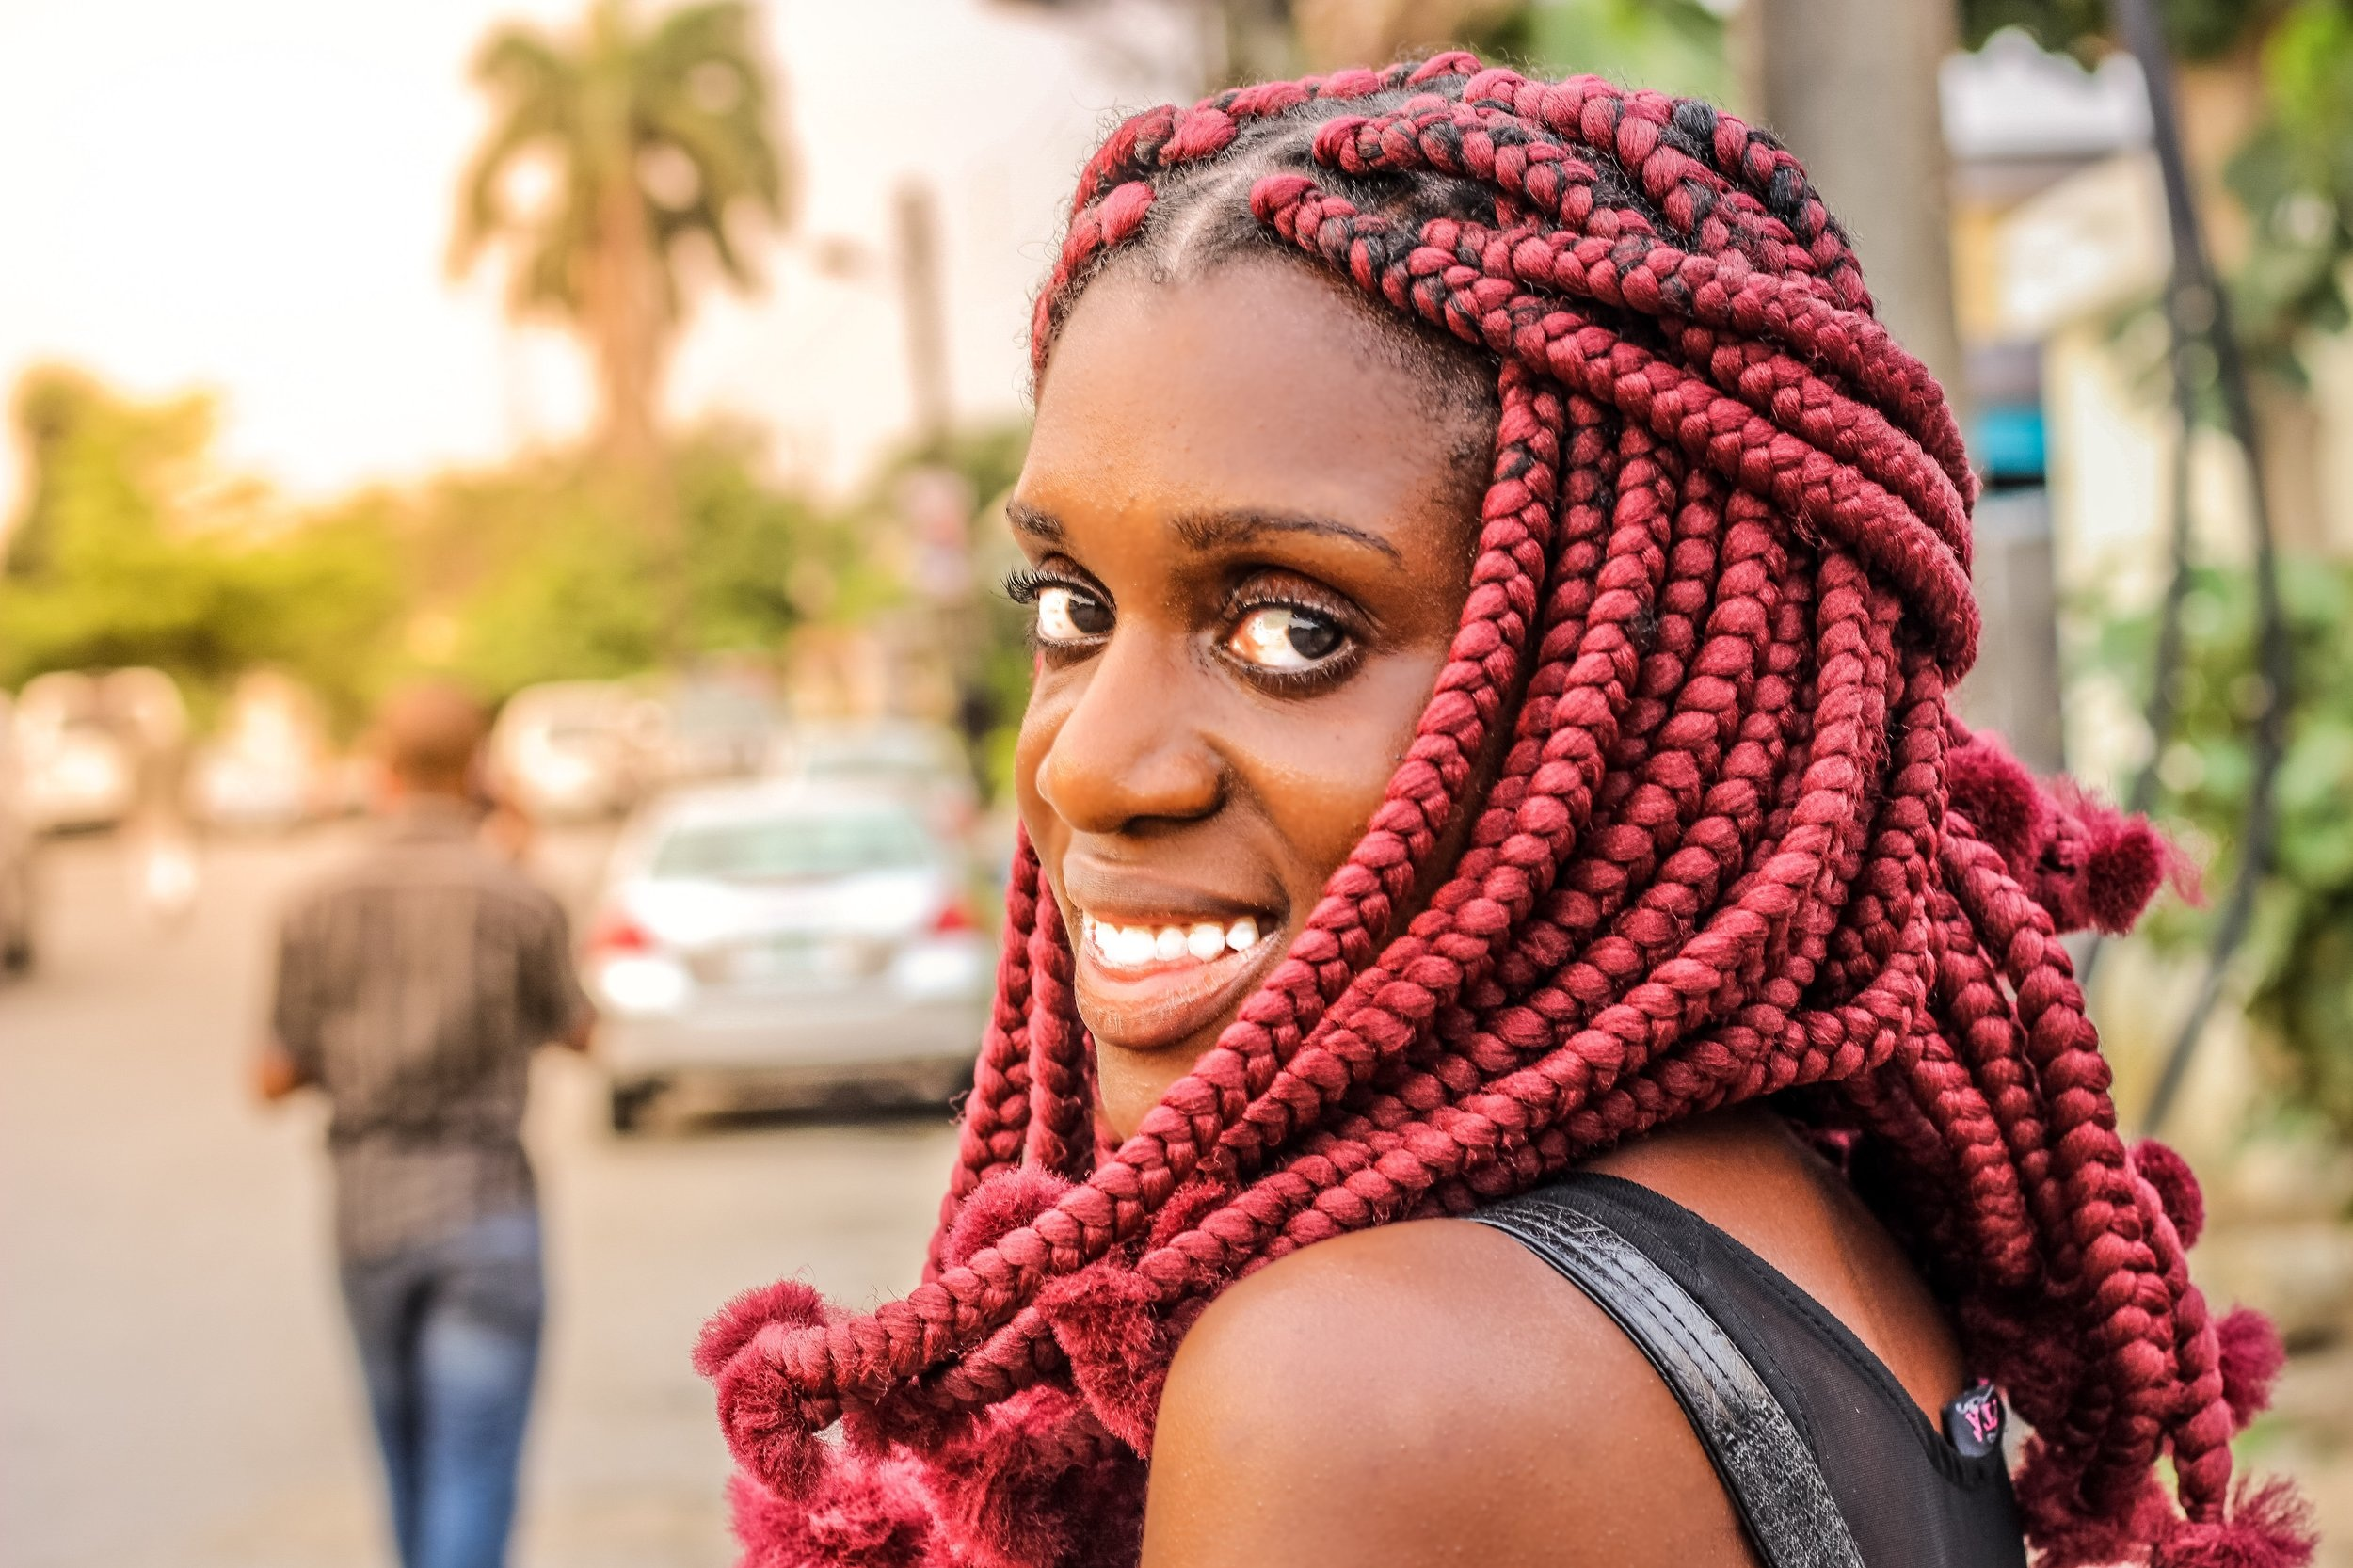 Diaspora Sol - A 3-day transnational solidarity event to connect the African Diaspora in La Habana, Cuba.